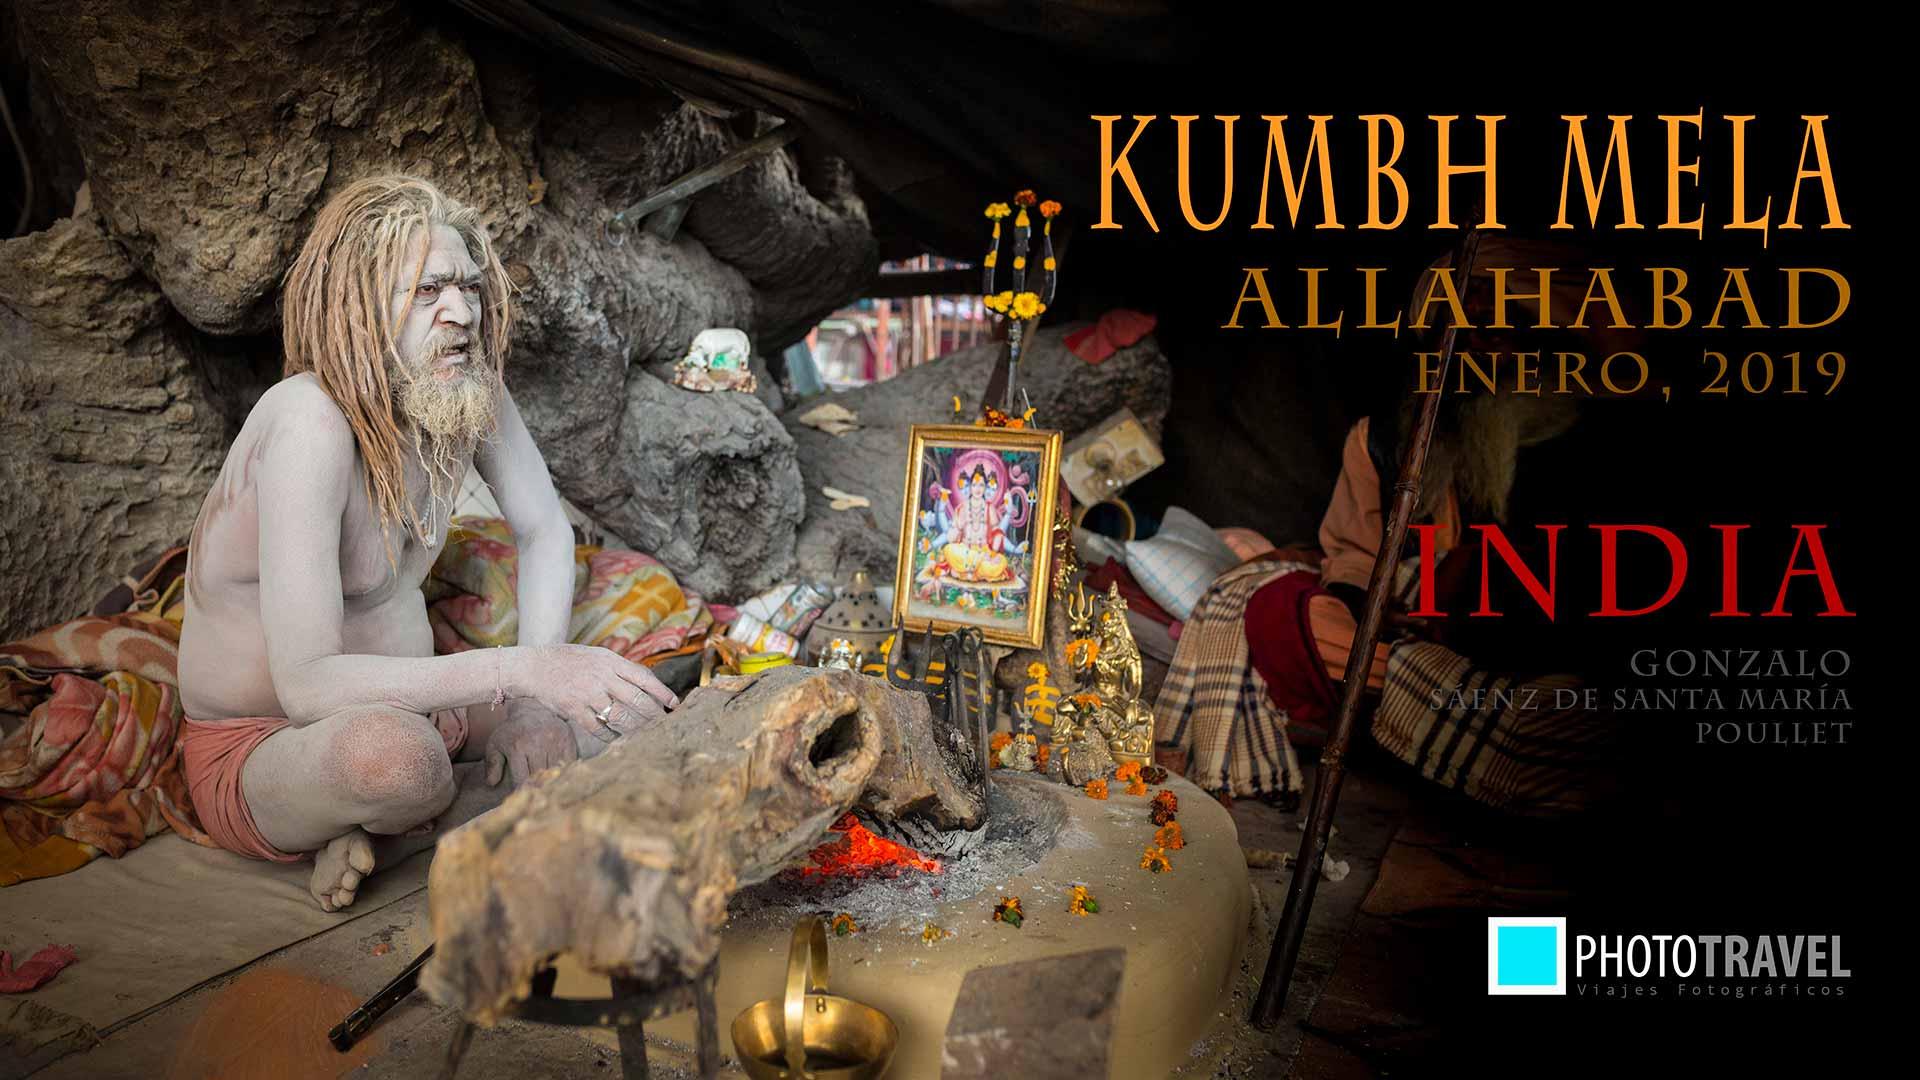 viaje-fotografico-Kumbh-mela